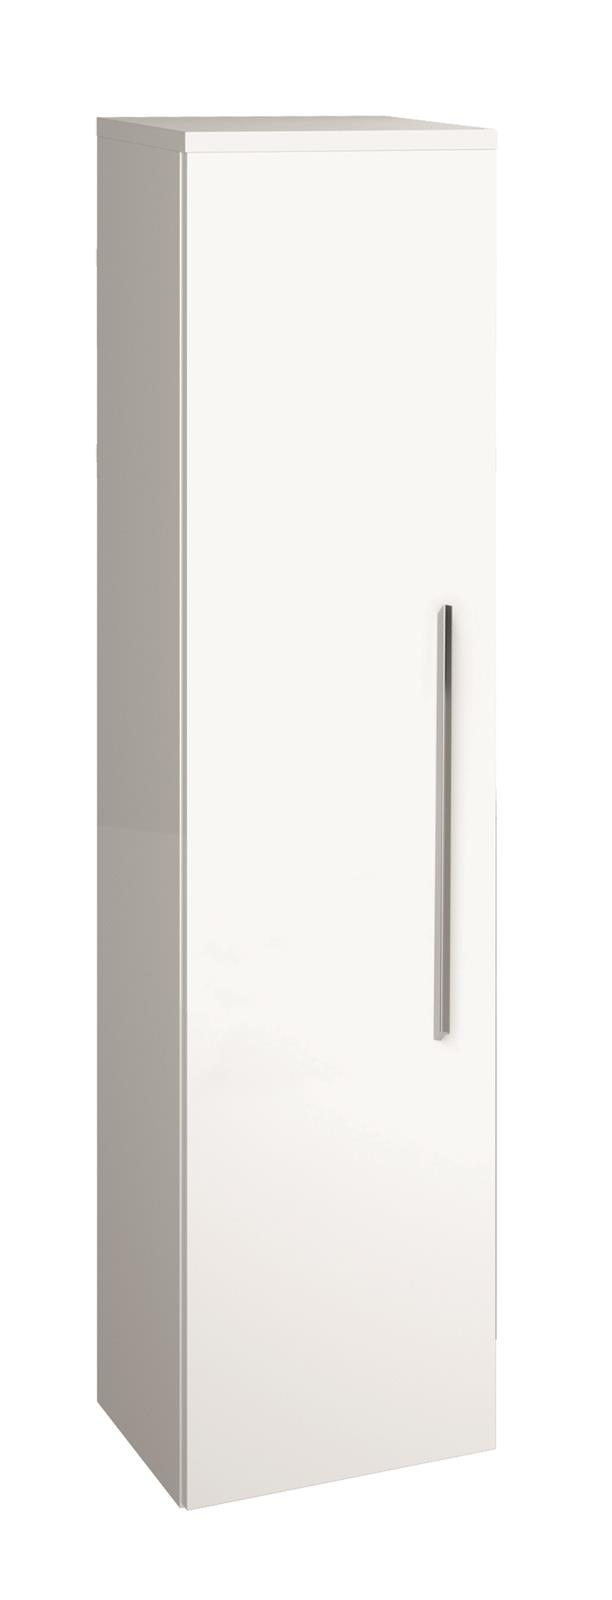 colonne 1 porte s rie adesio 3 sanitaire distribution. Black Bedroom Furniture Sets. Home Design Ideas